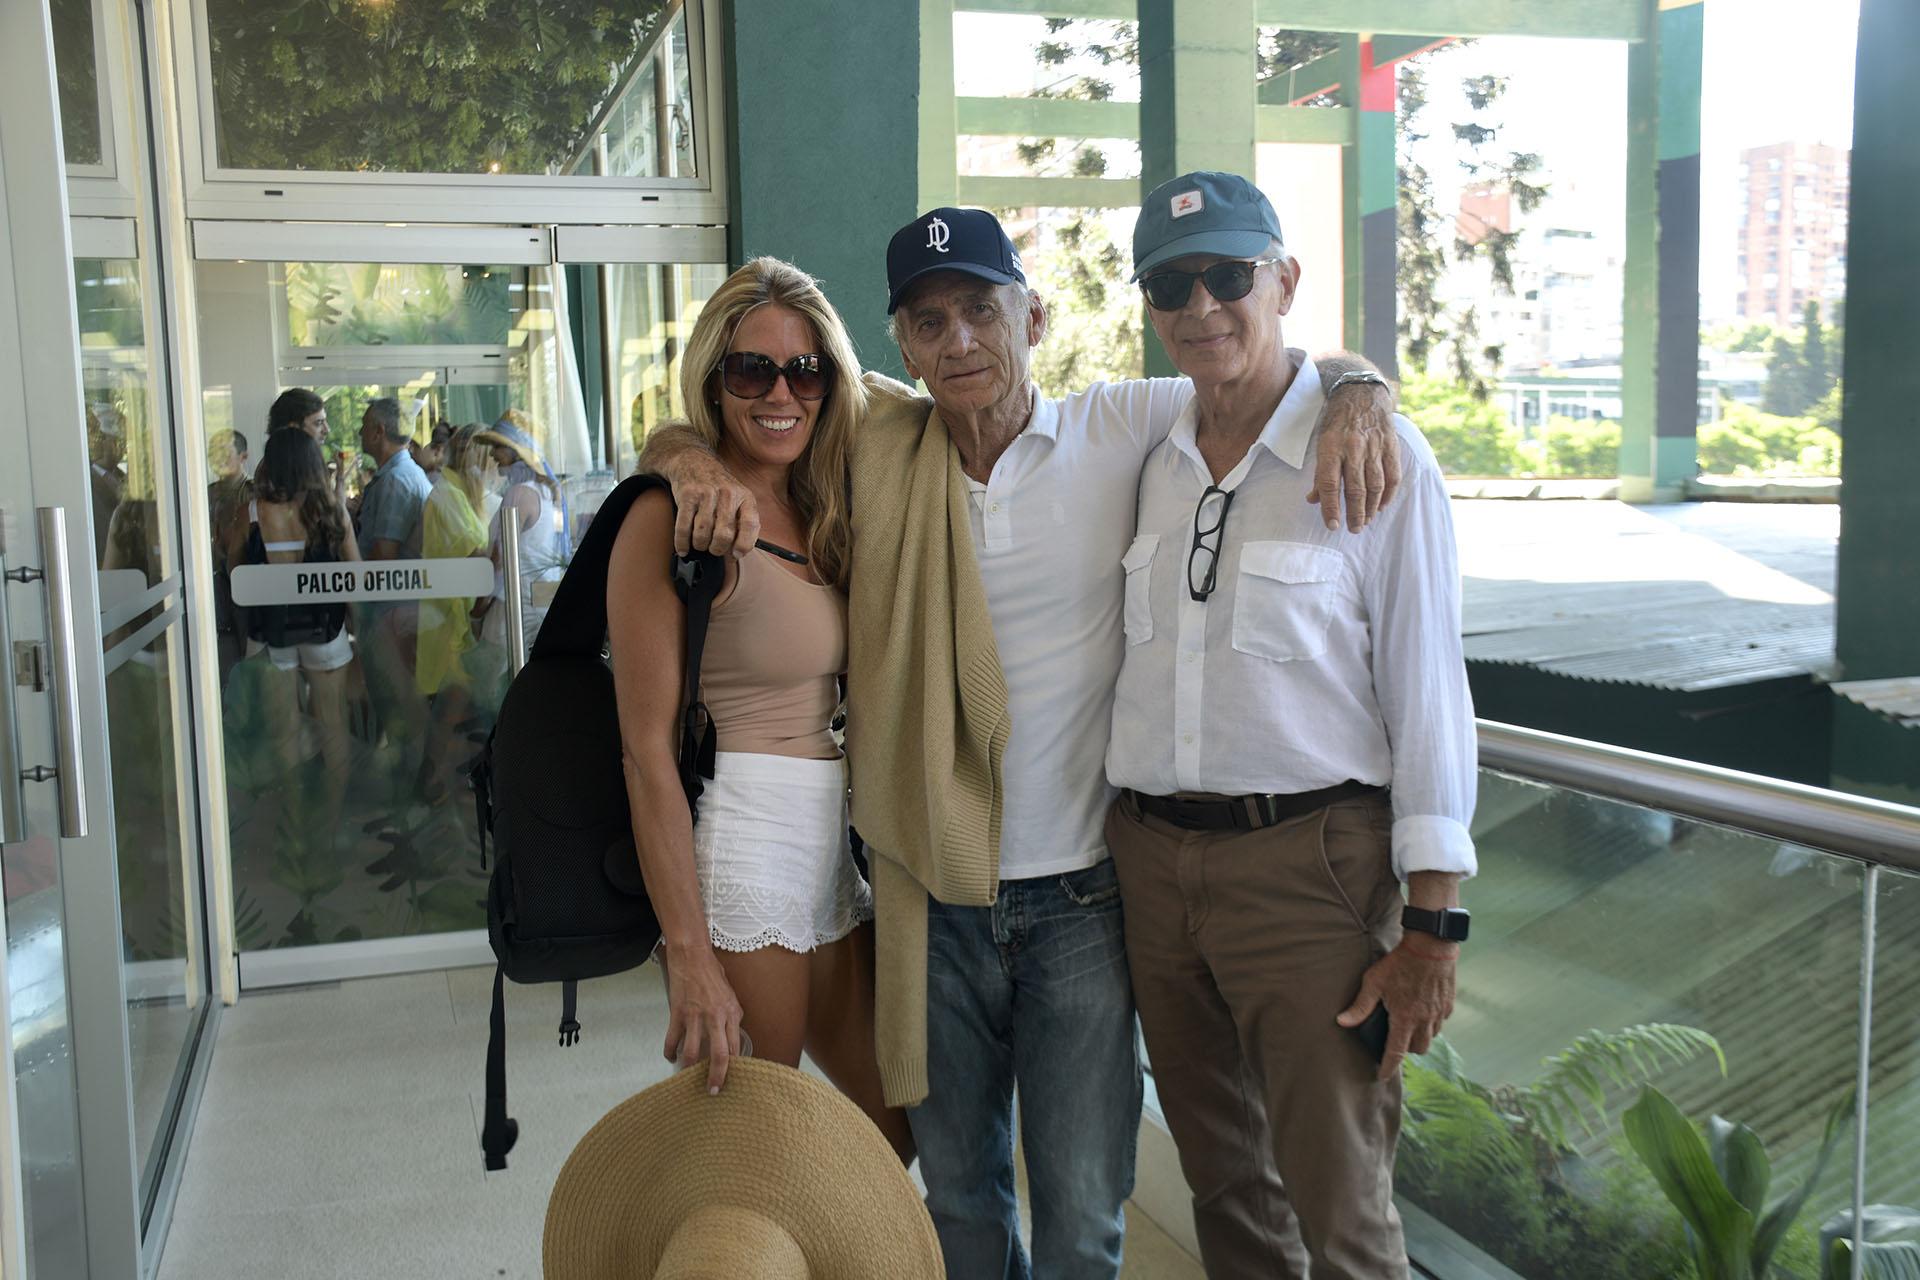 Adolfo Cambiaso (padre) y su pareja junto a Eduardo Costantini